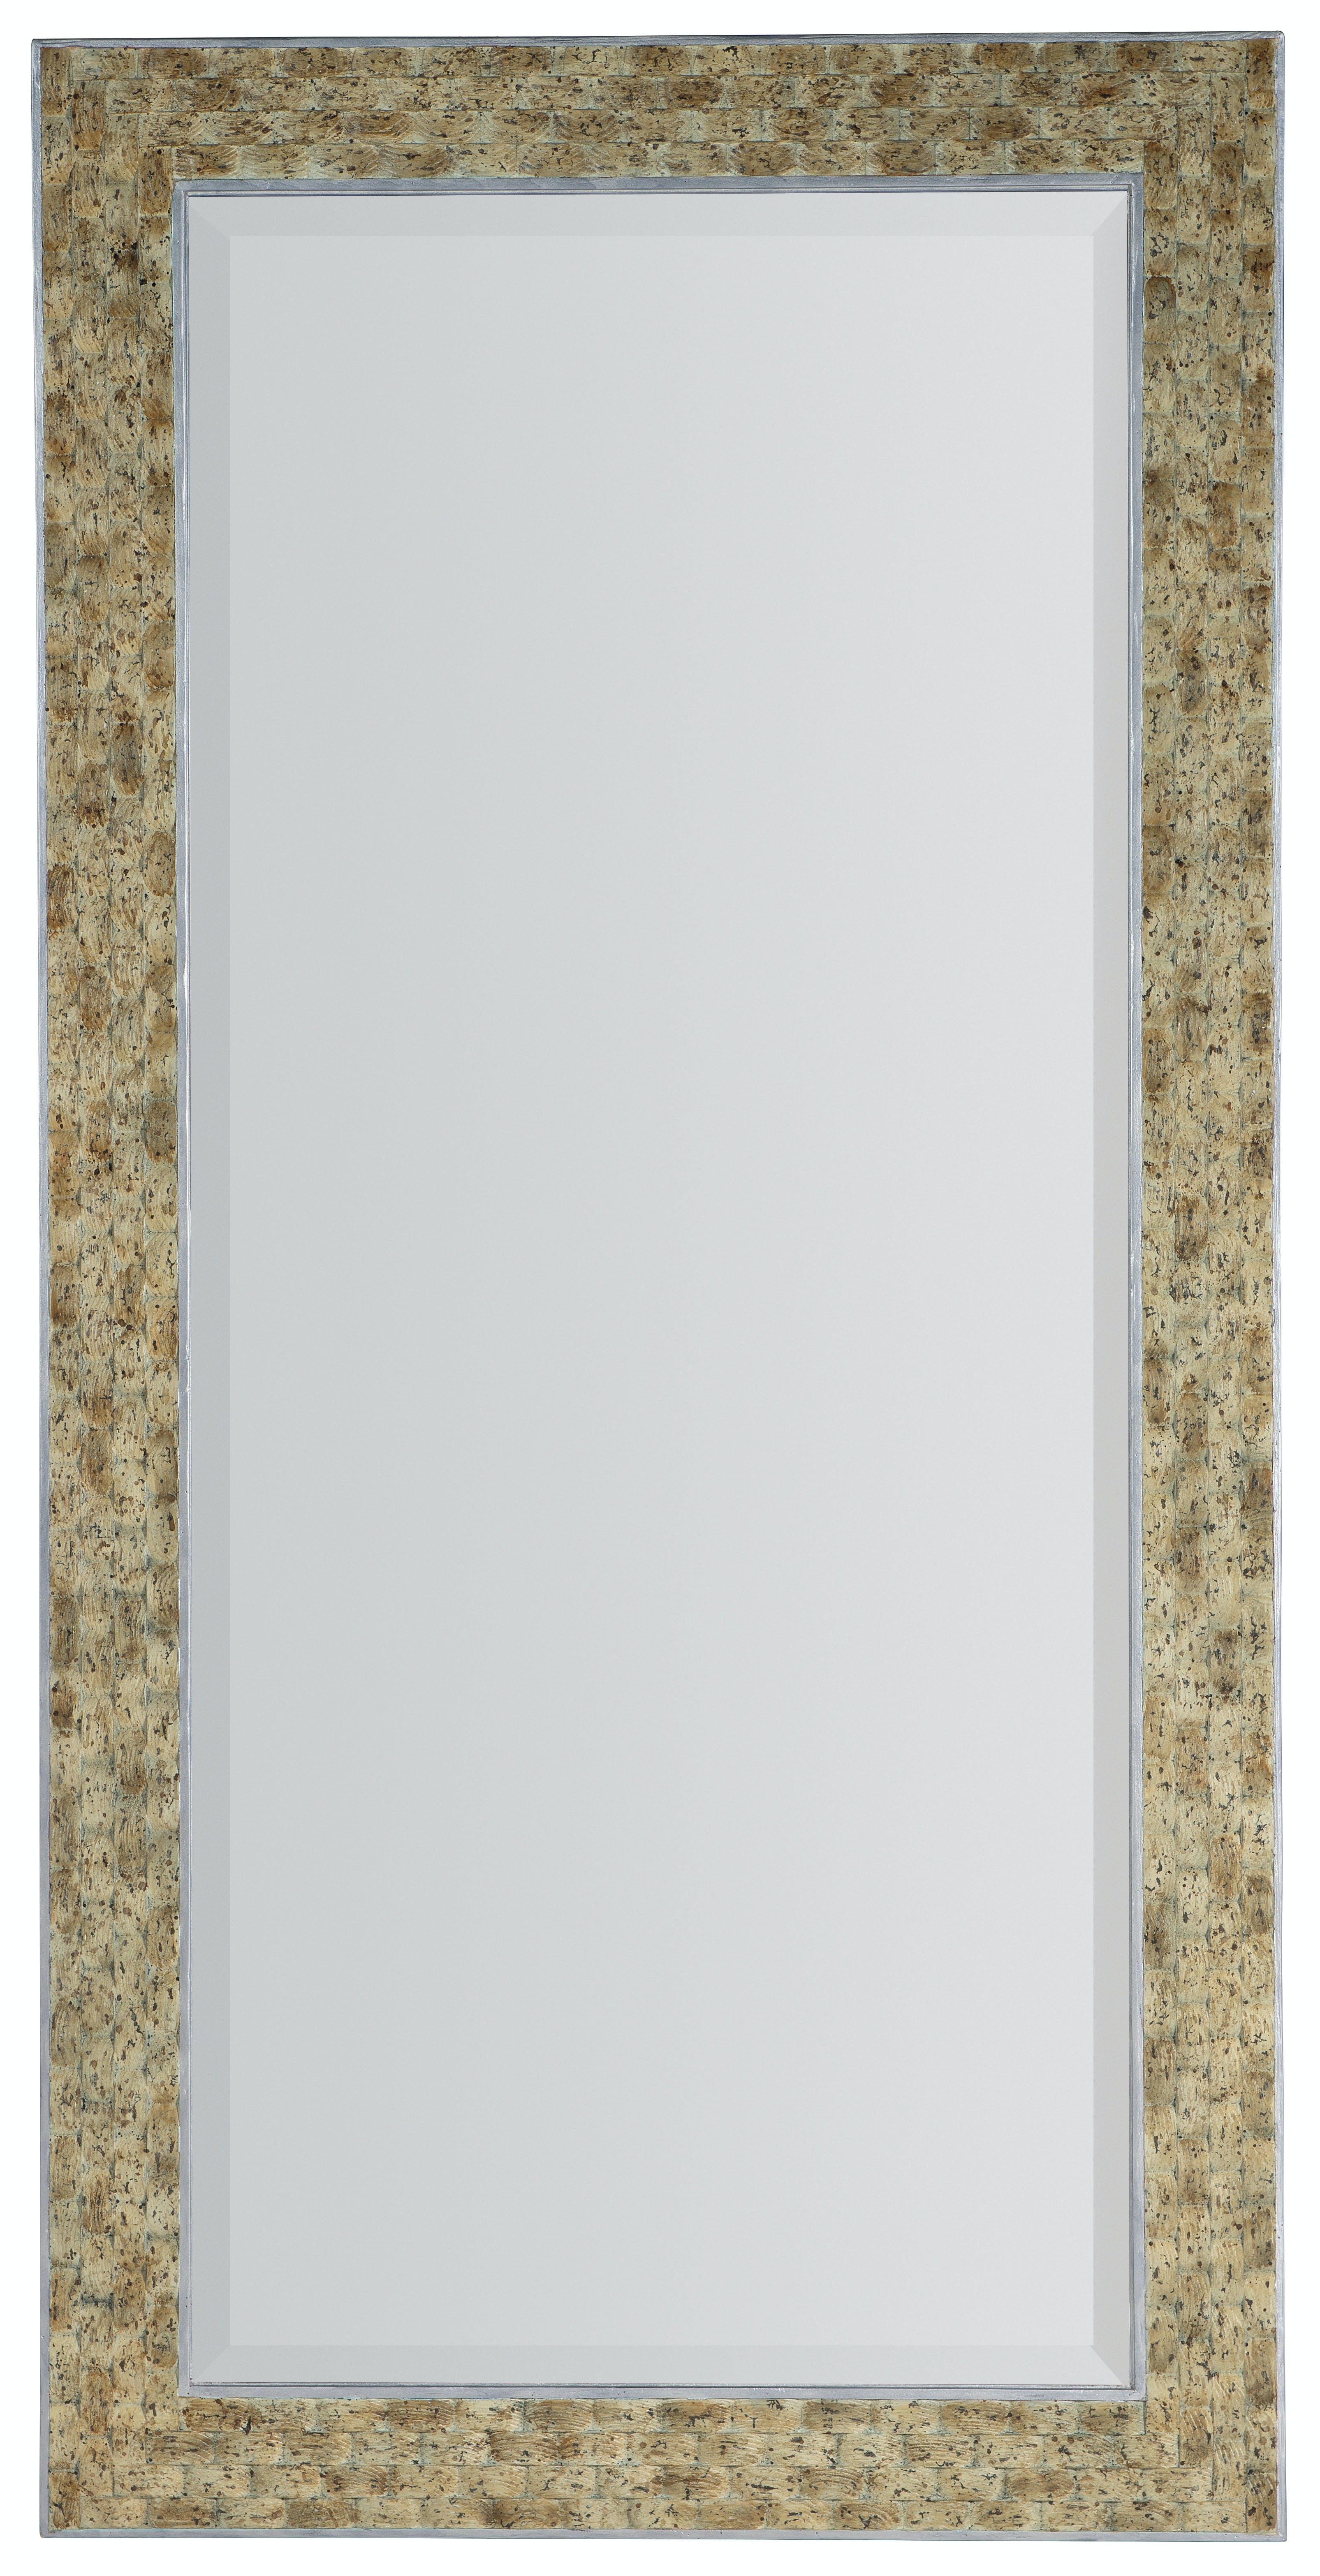 Hooker Furniture Accessories Surfrider Floor Mirror 6015 50004 80 White House Designs For Life